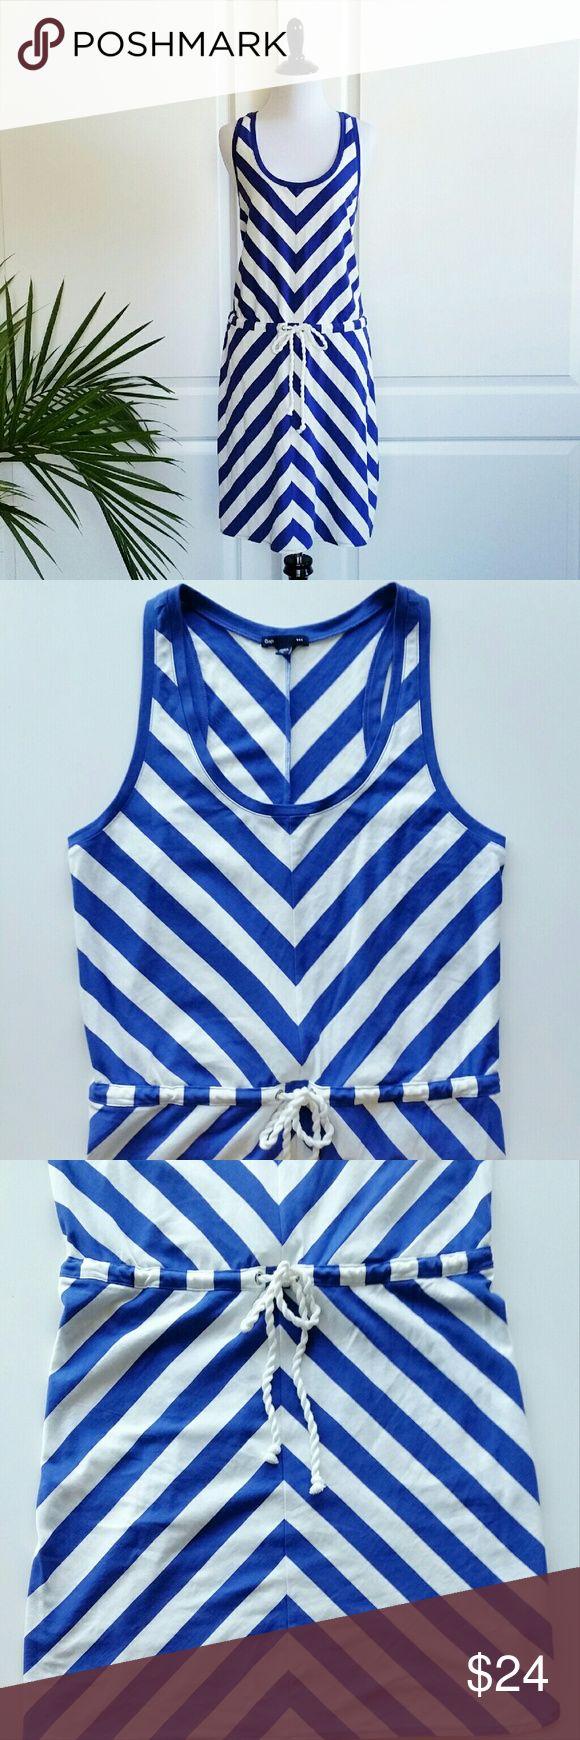 "Gap Blue Chevron Tank Drawstring Dress/Cover Up Gap Blue Chevron Tank Drawstring Dress / Cover Up  *Size Medium - Underarm to underarm : 18"" flat / Waist : 18"" flat / Shoulder to hem : 38.5"" *Royal blue / White color *Waist drawstring / Sleeveless  *60% Cotton / 40% Modal  *New without tags  *No trade GAP Dresses"